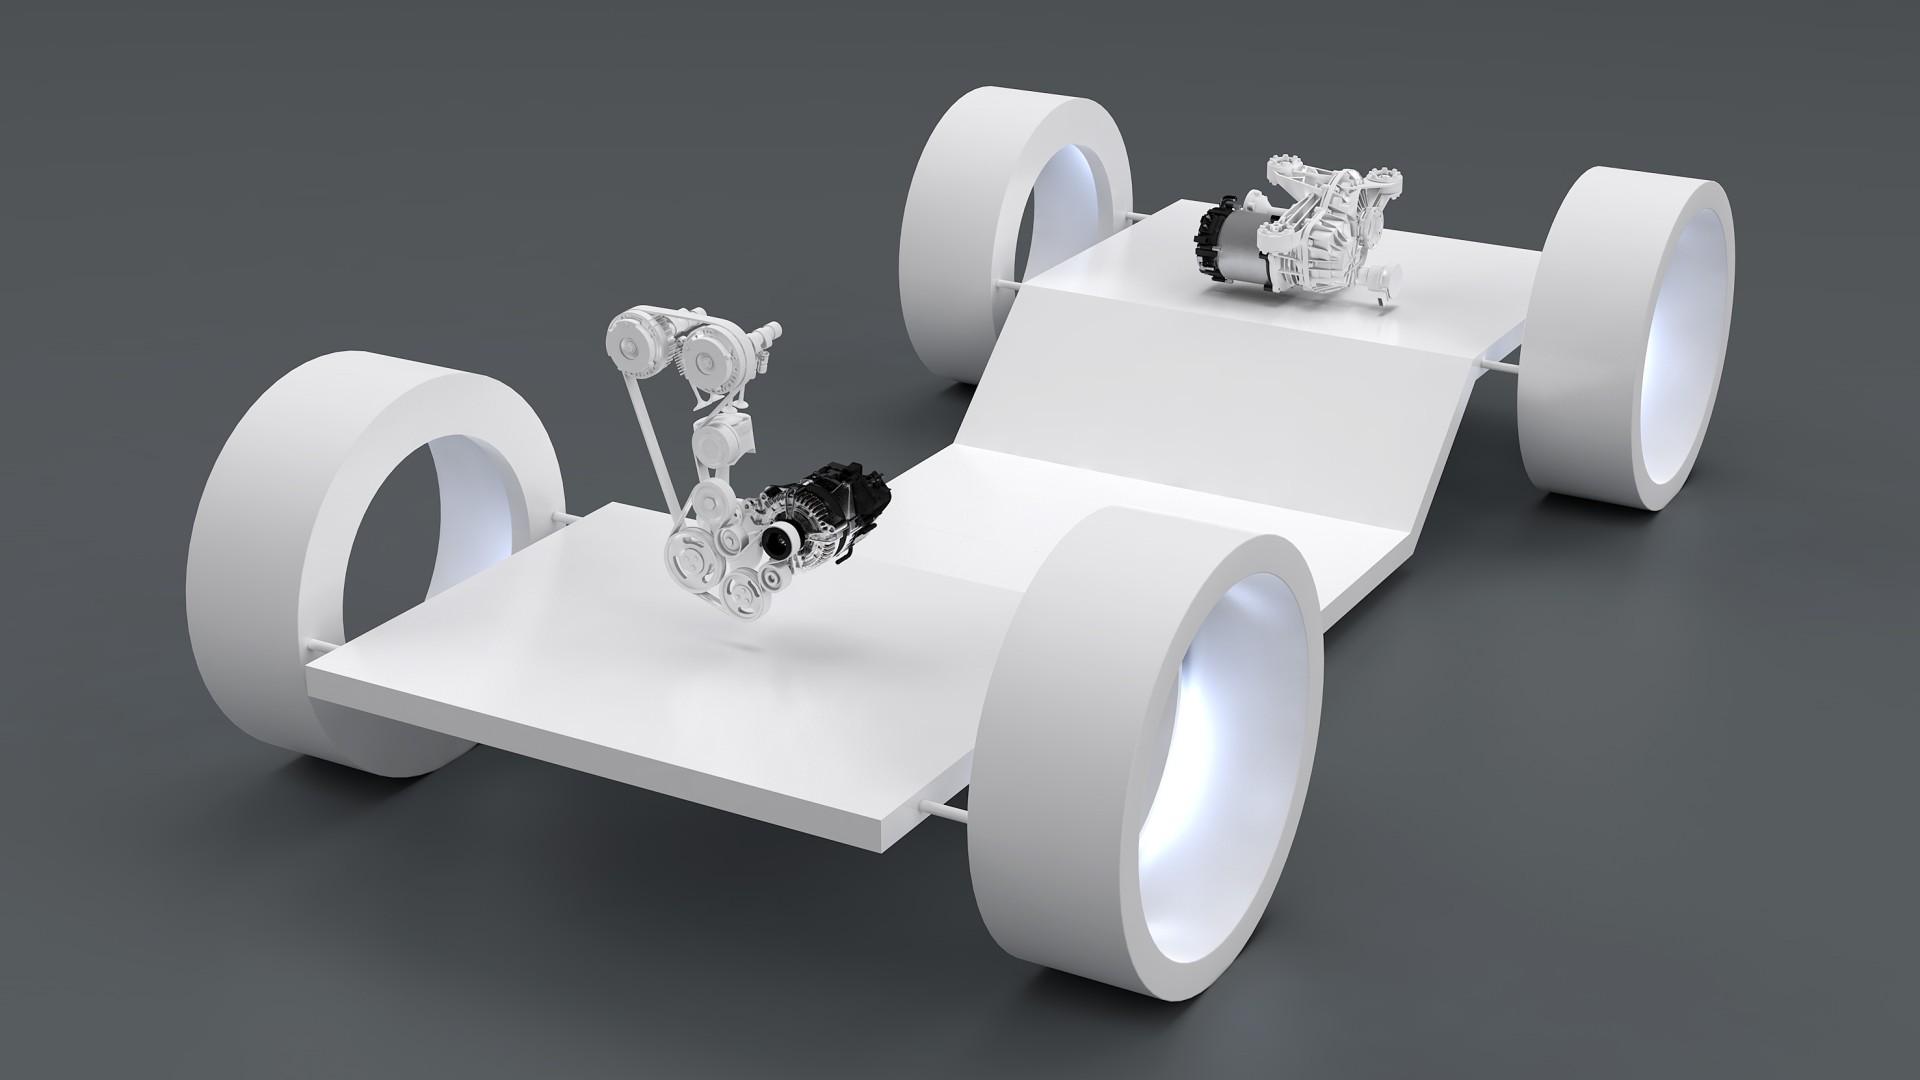 Messeexponat kombiniert 48V P0 Boost Recuperation Machine mit 48V P4 E-Motor